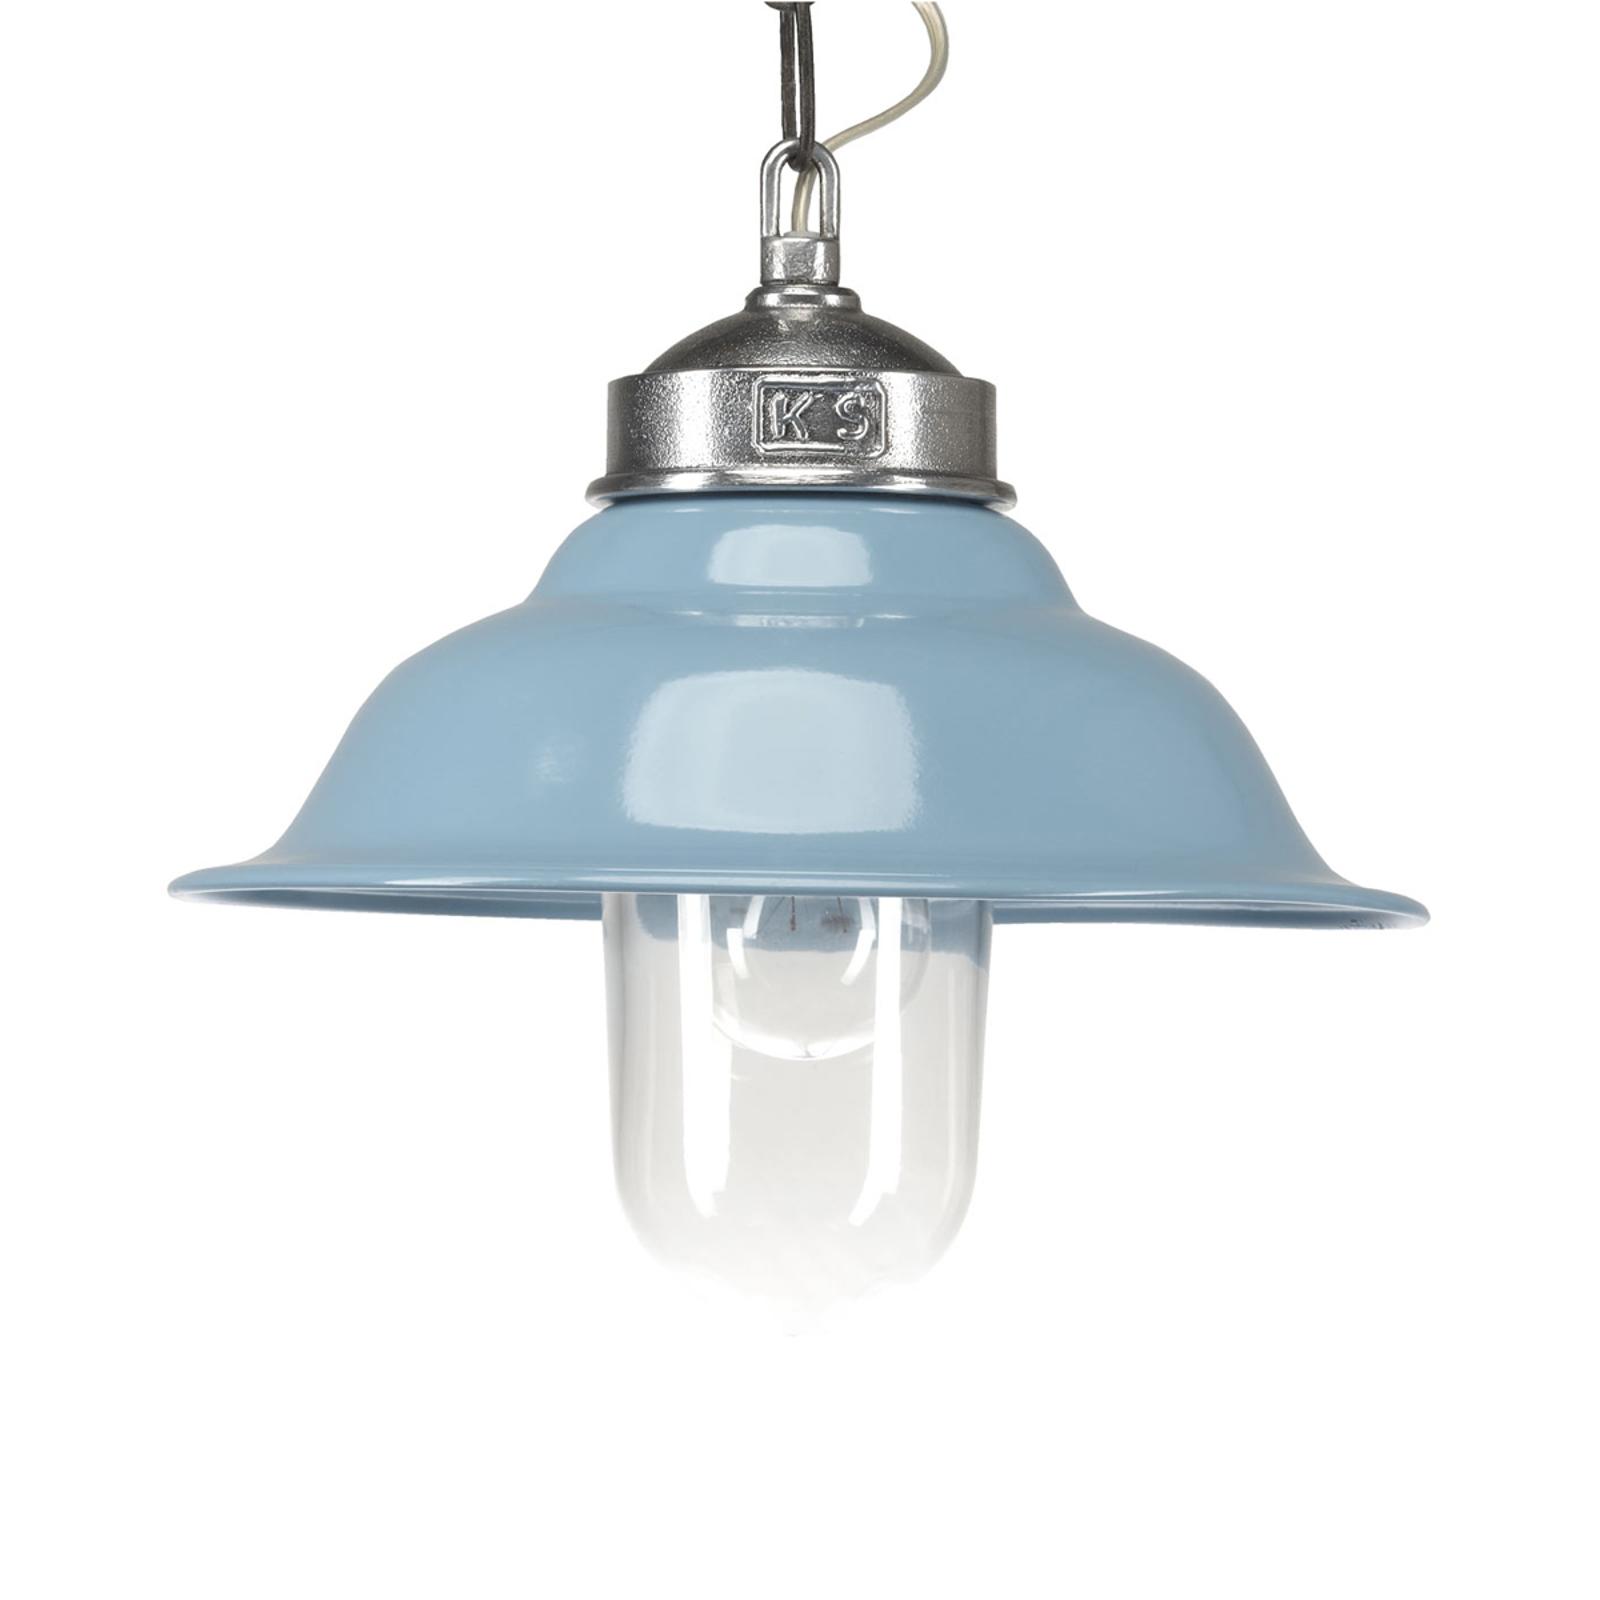 Blauwe Retro-hanglamp Porto Fino